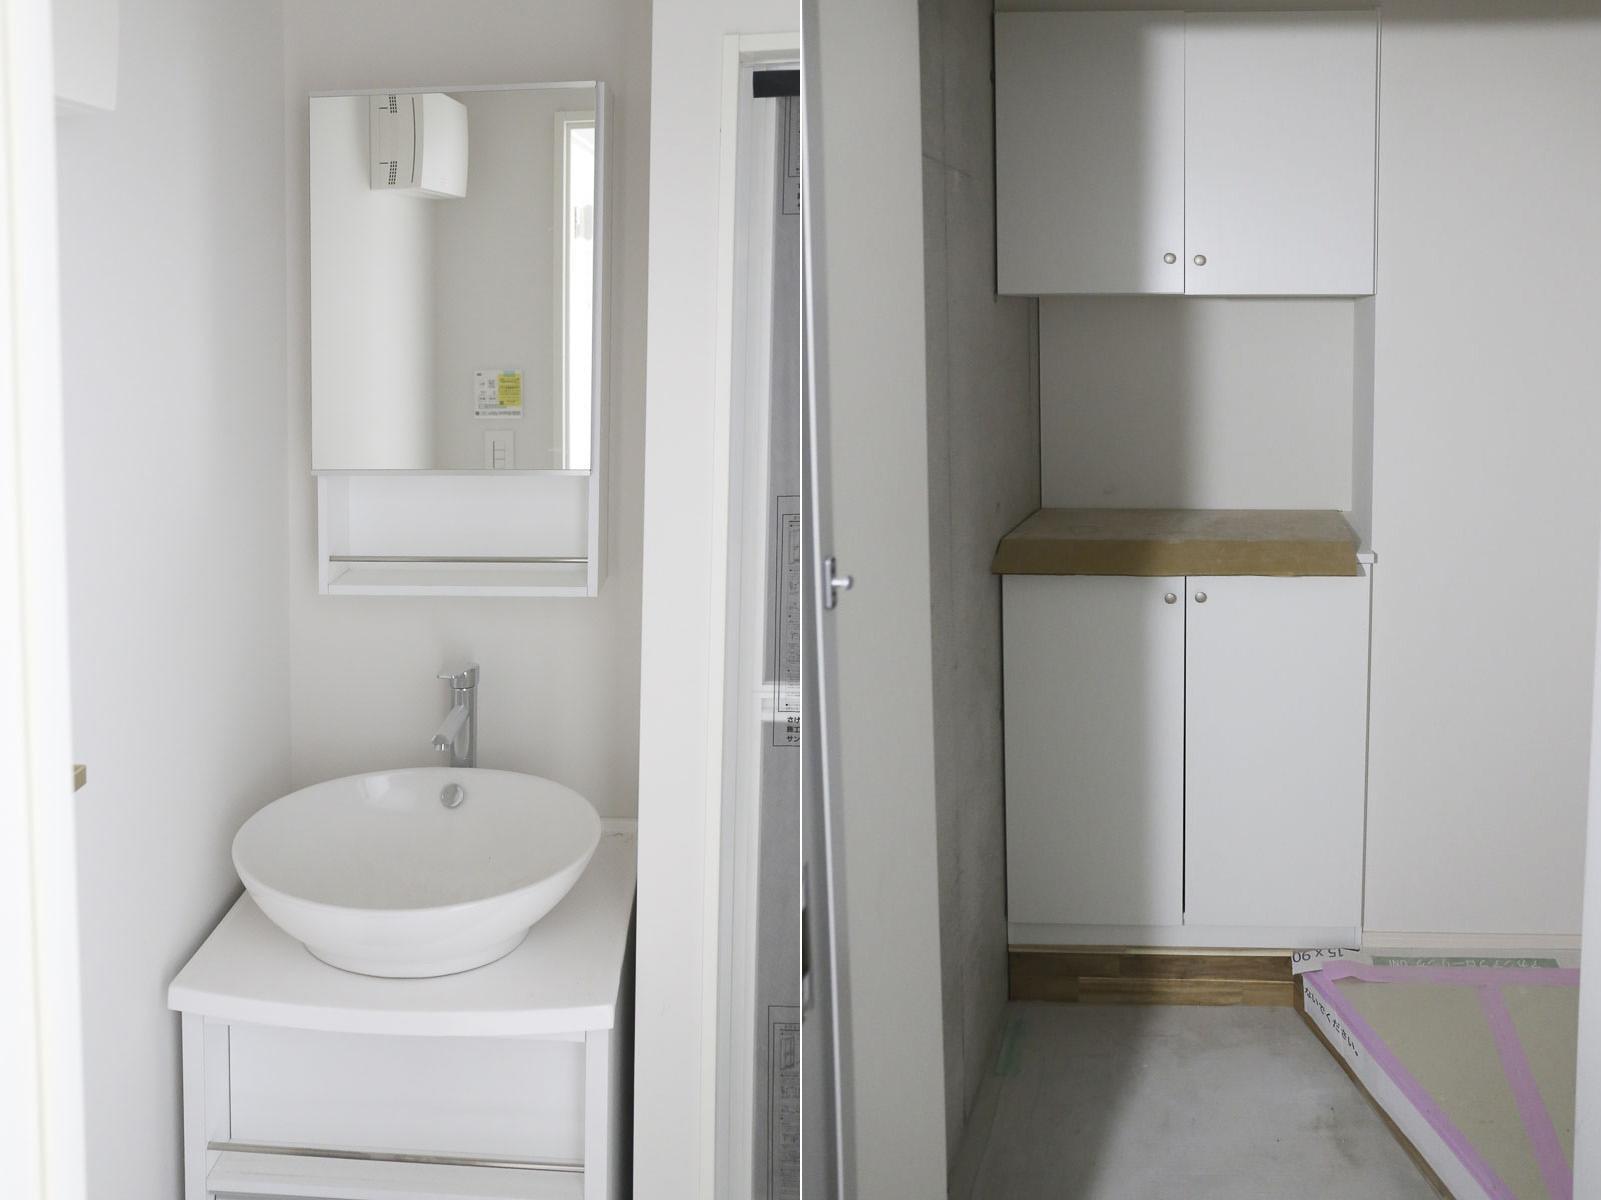 Dタイプの洗面台と玄関スペース